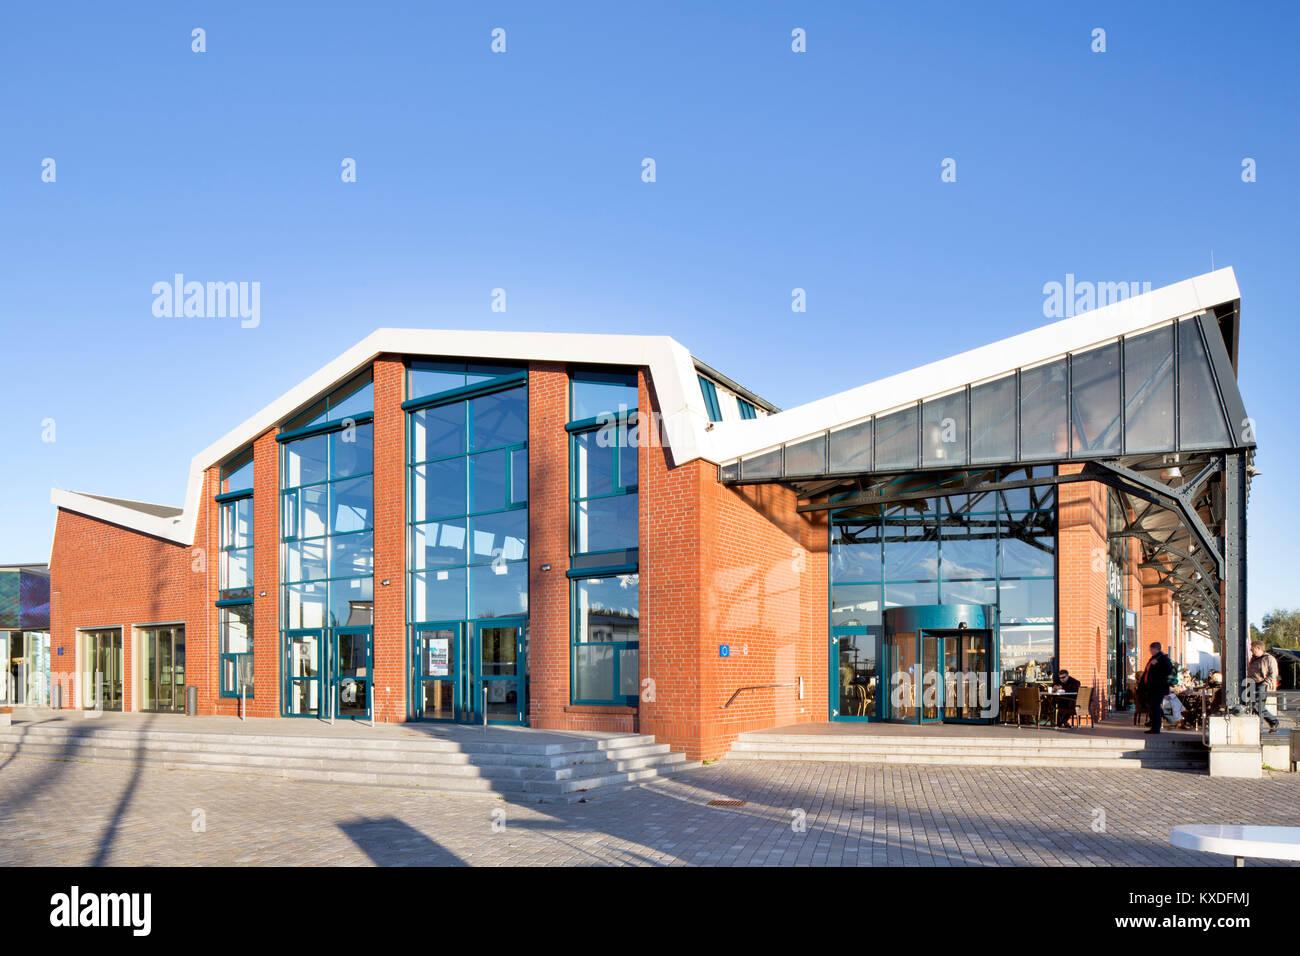 Maritime experience world,fishing port,Bremerhaven,Bremen,Germany - Stock Image